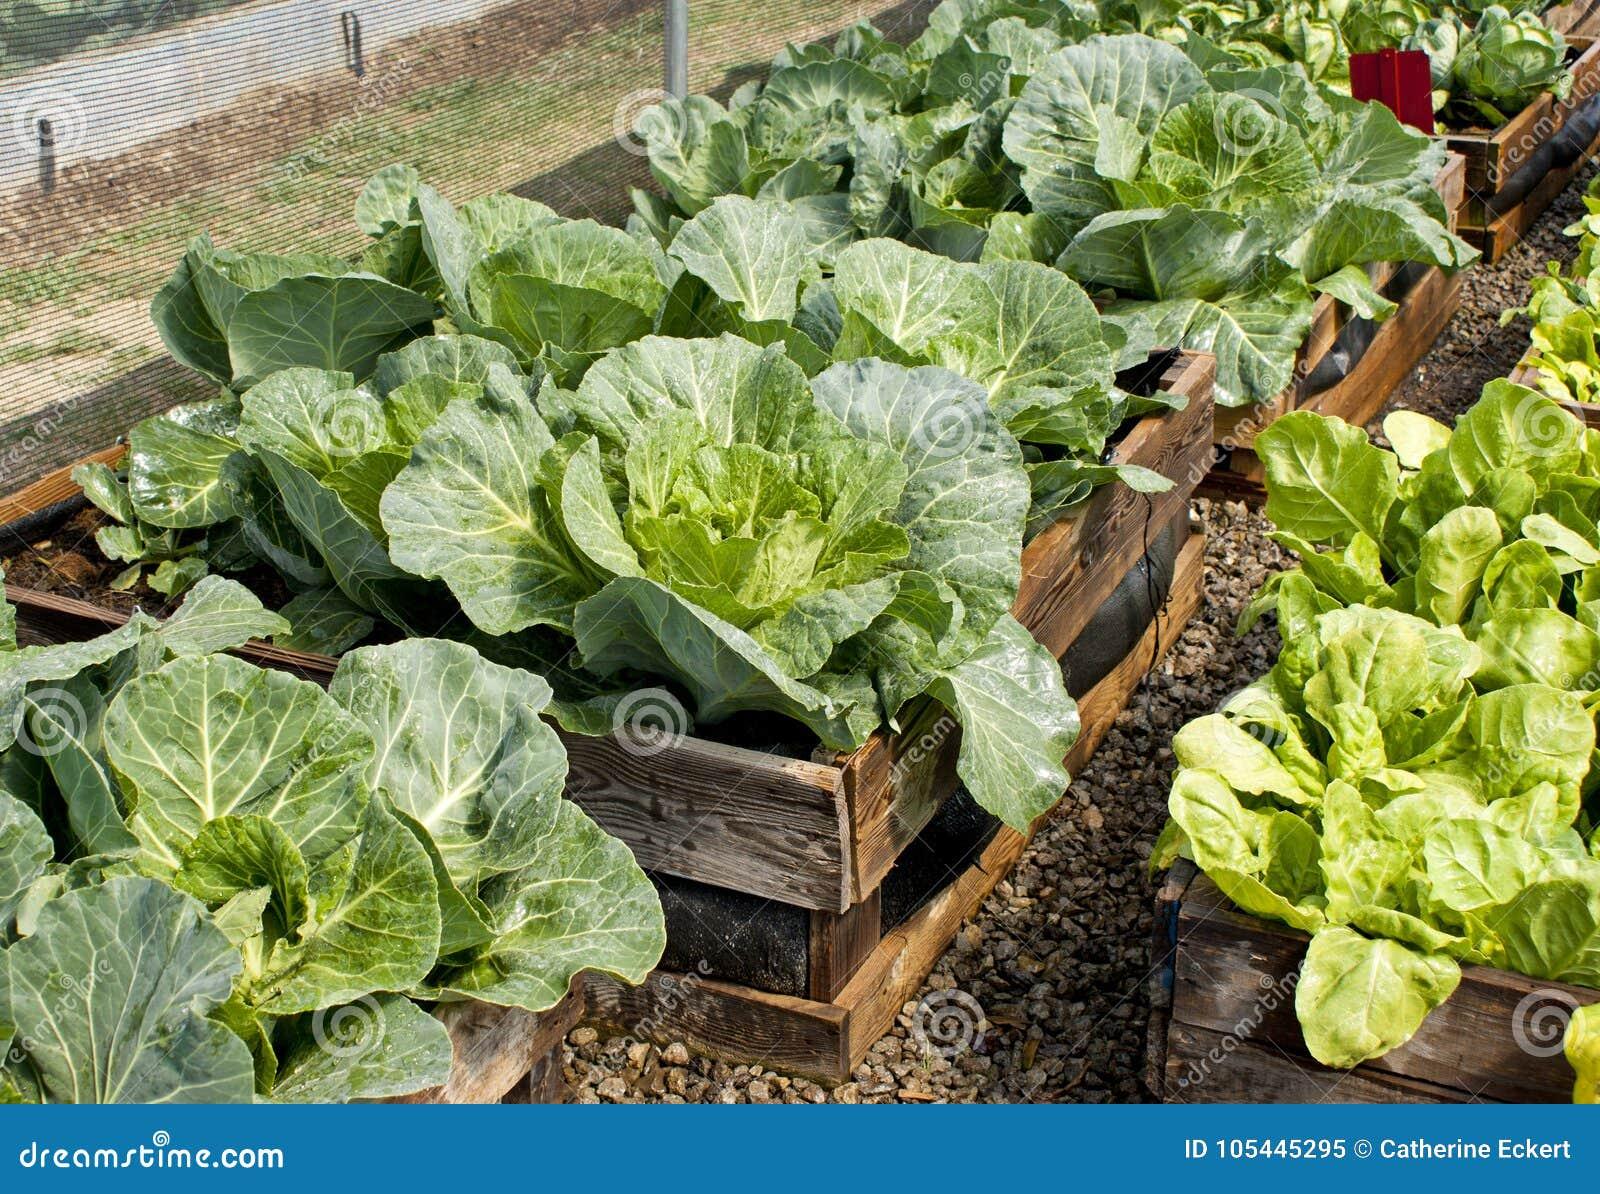 Picture of: Raised Bed Pallet Vegetable Garden Stock Image Image Of Lettuce Leaf 105445295